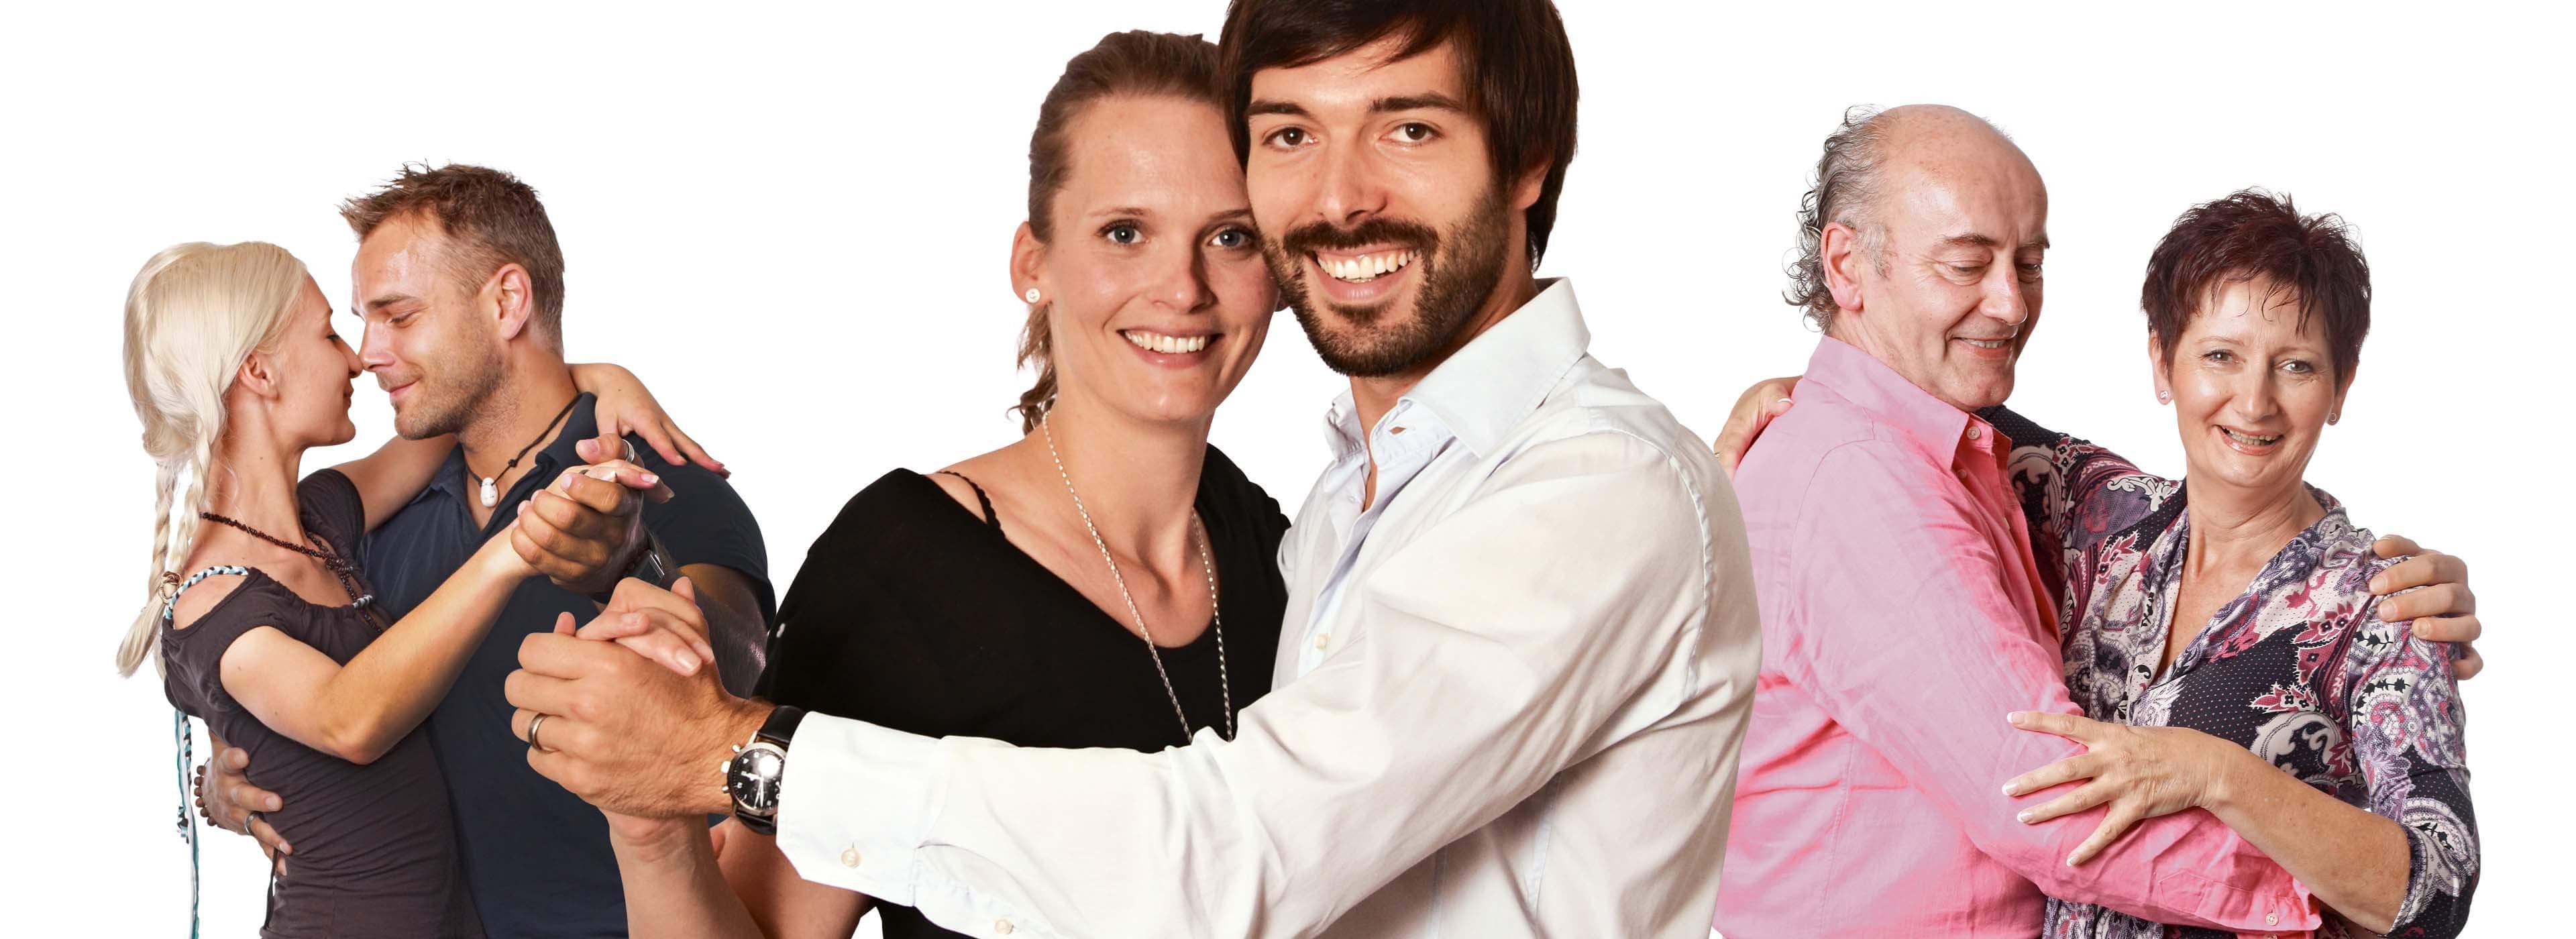 tanzschule single frankfurt)